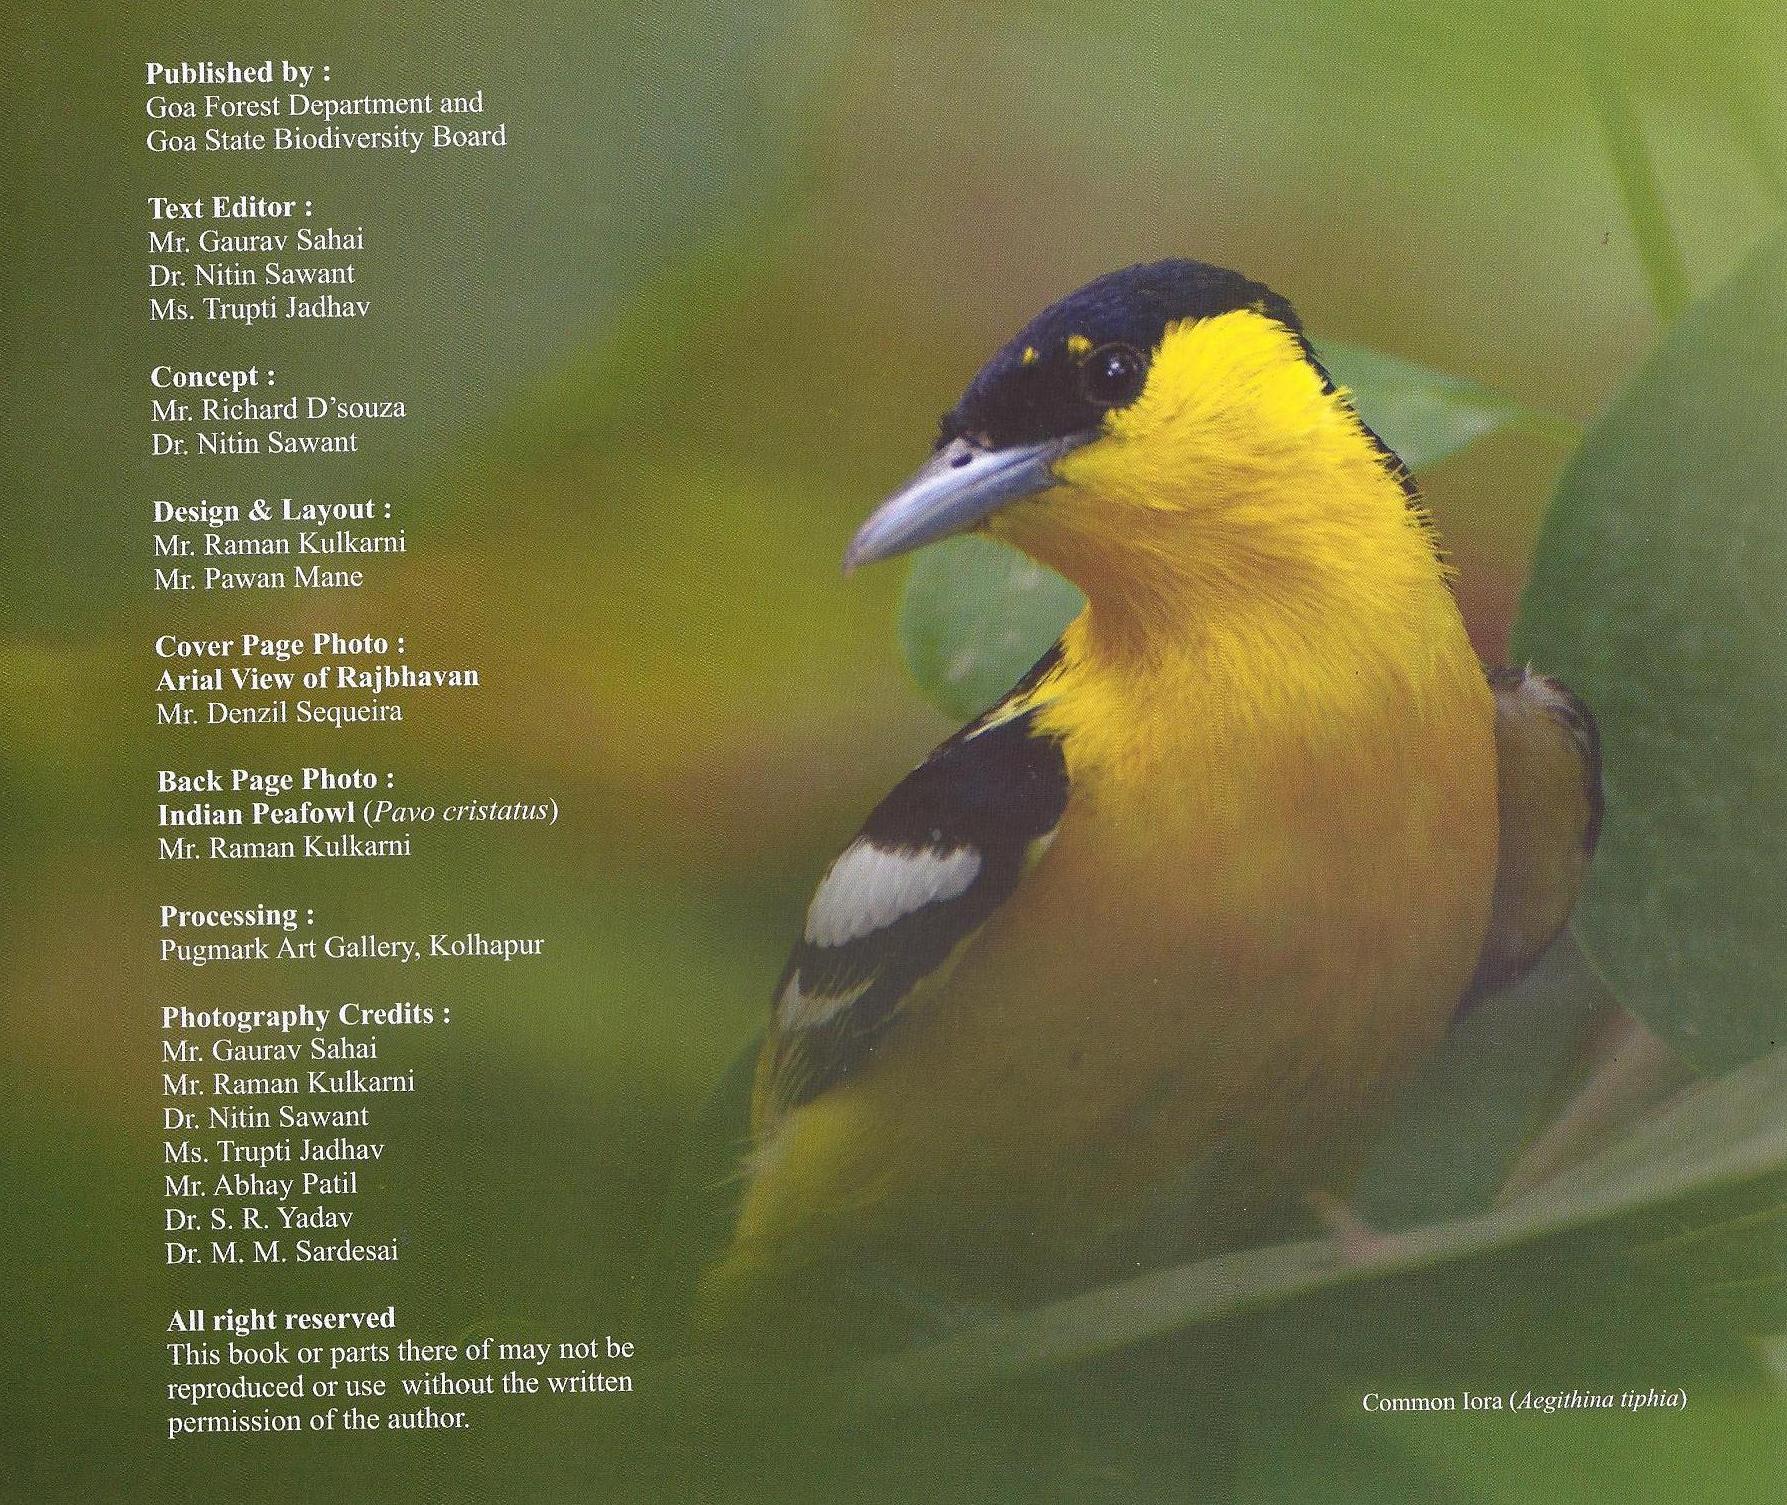 Rajbhavan book credits